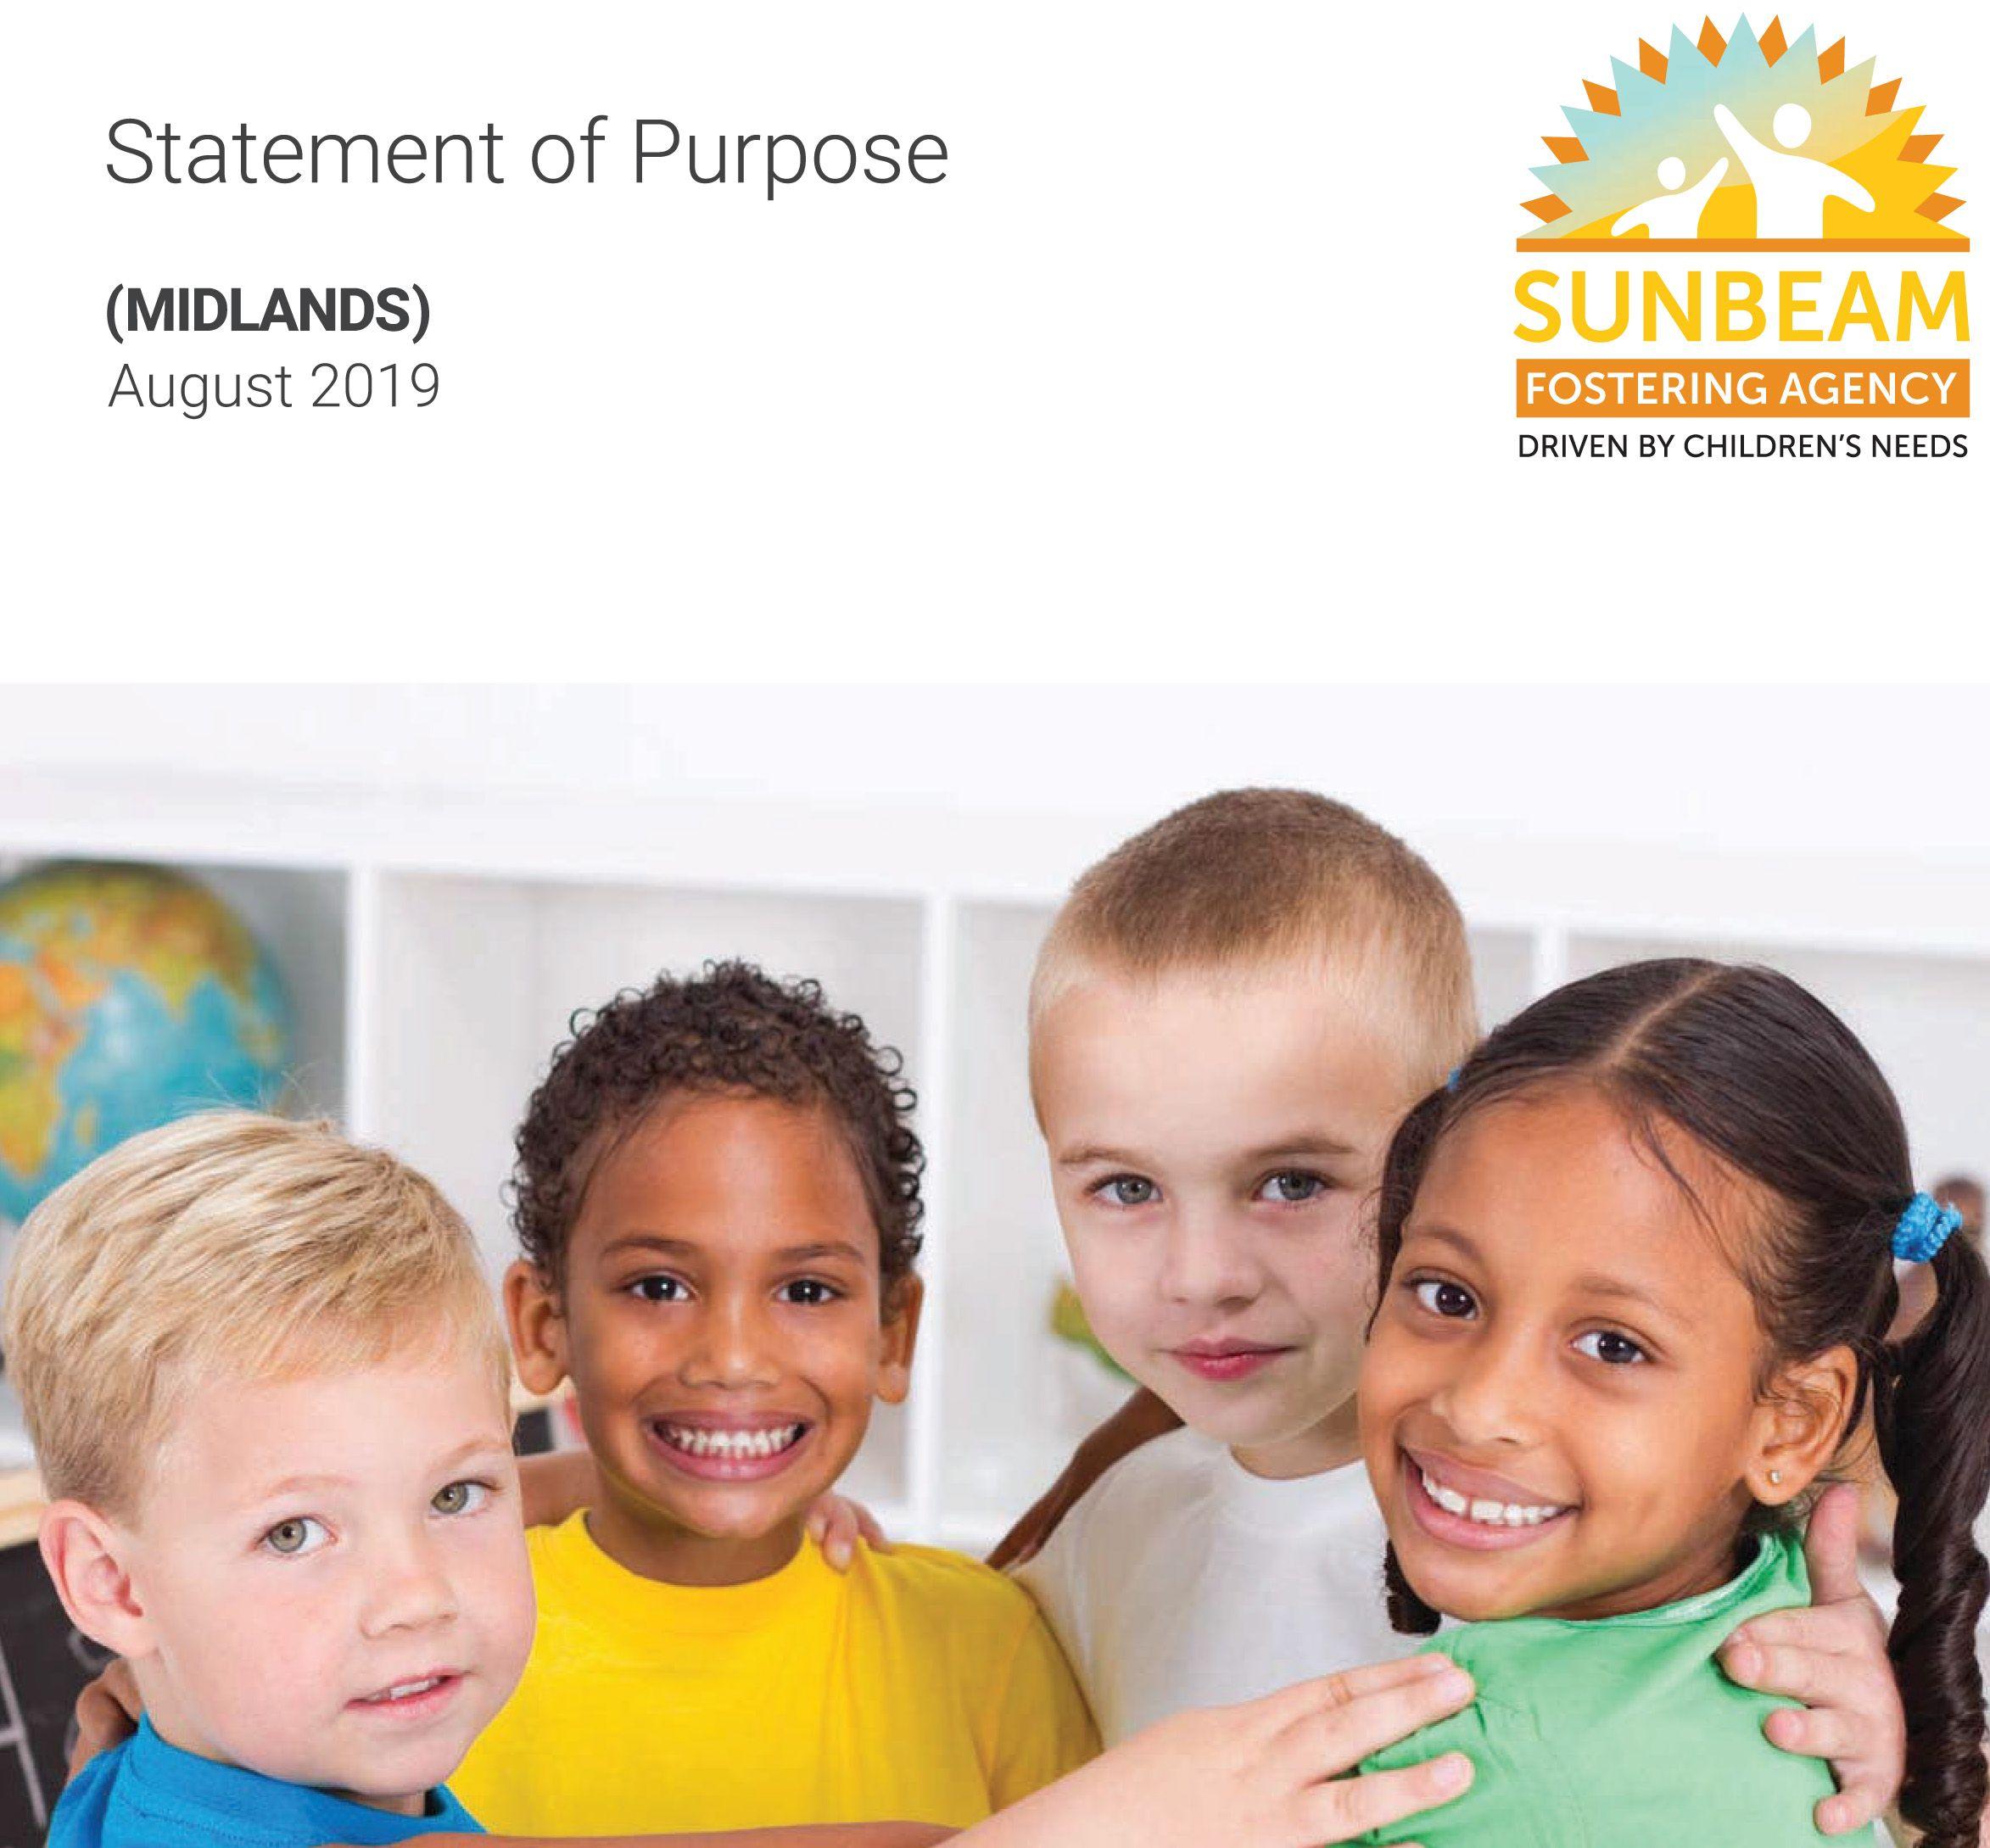 Statement of Purpose Midlands